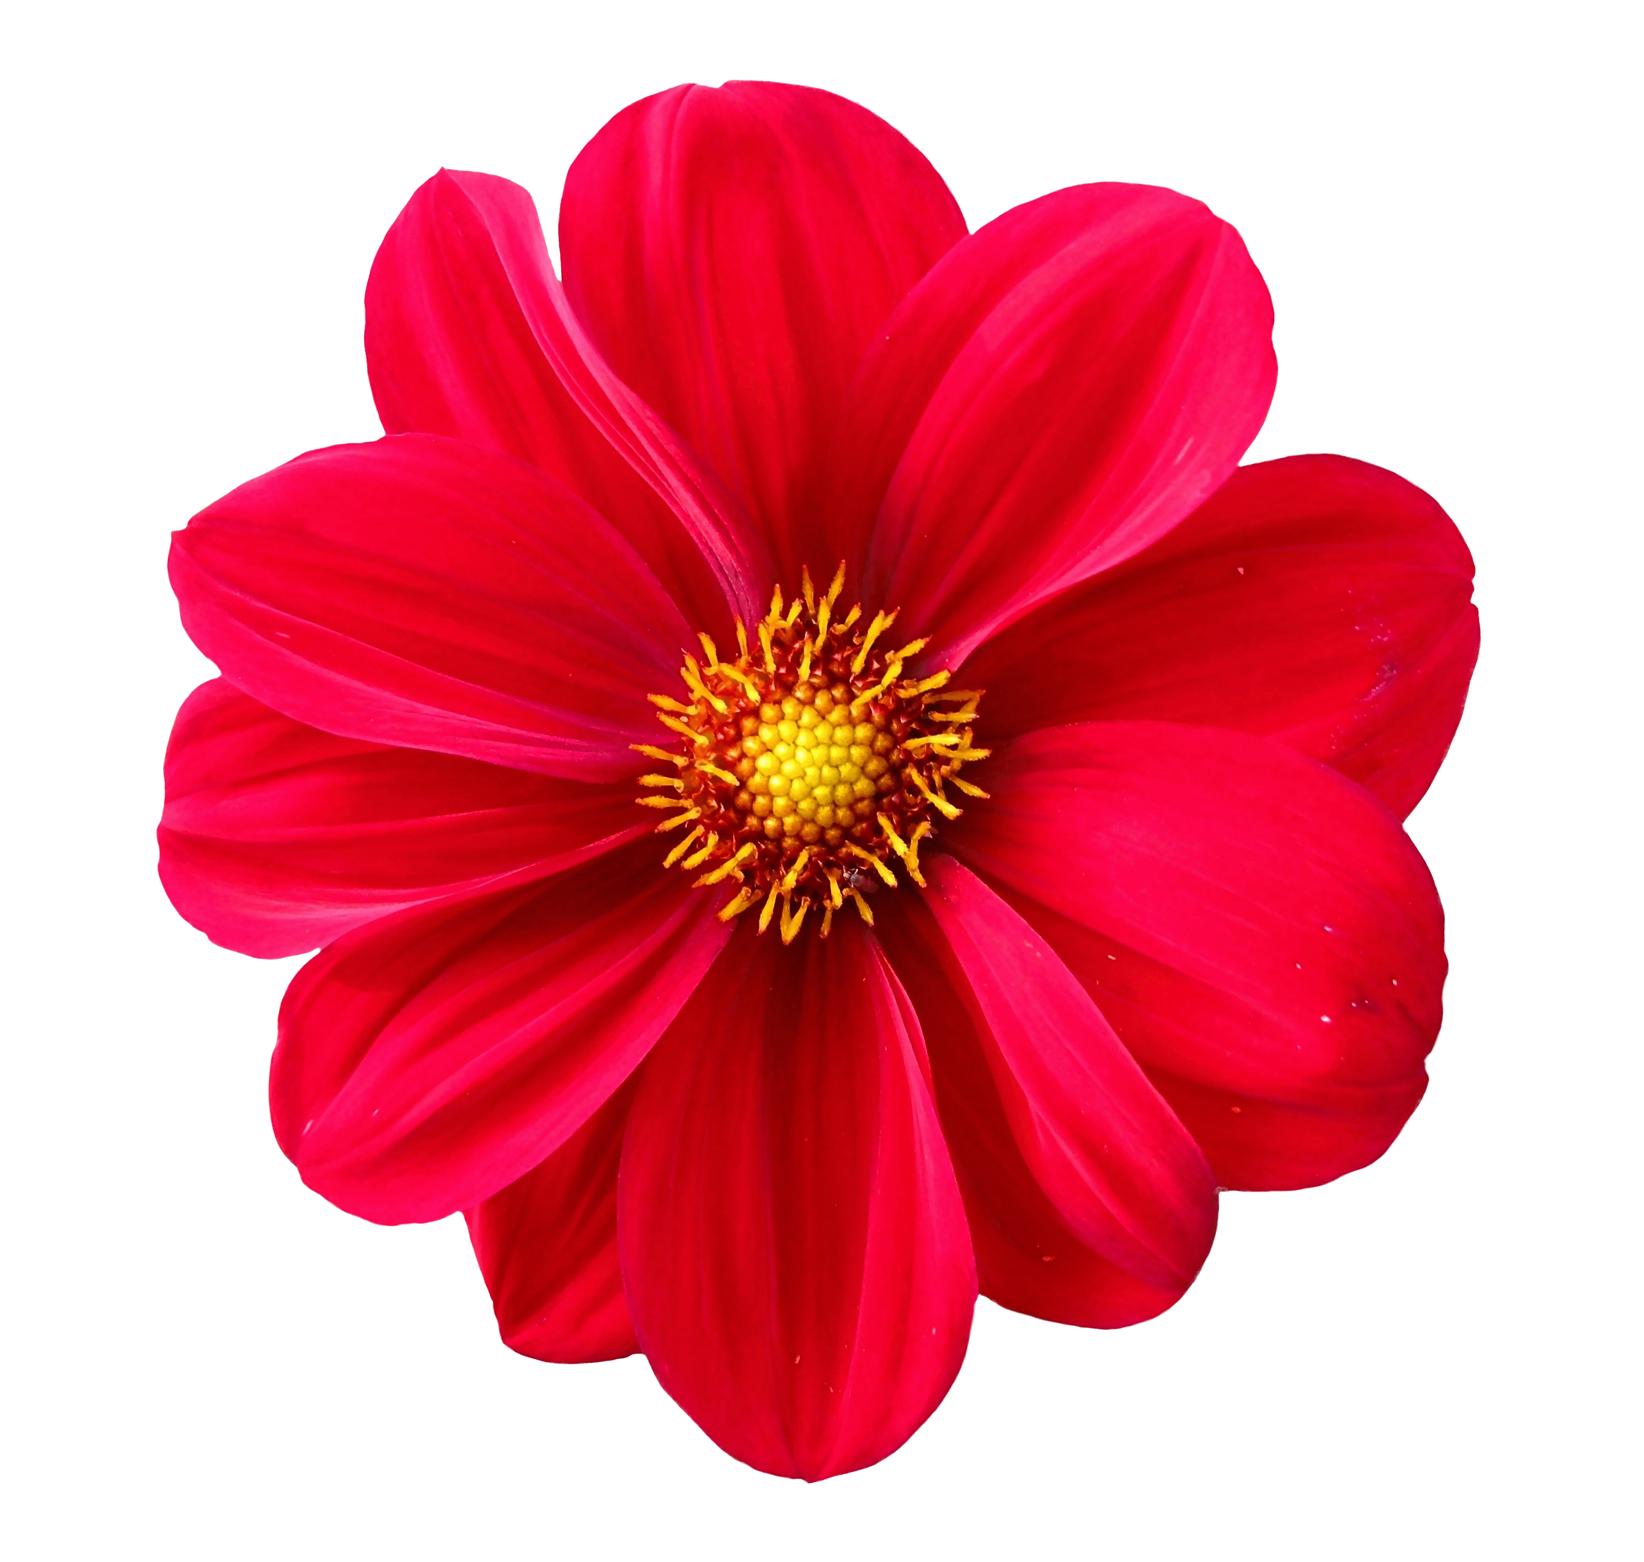 Dahlia Flower Png Image Flower Png Images Flower Clipart Flower Aesthetic